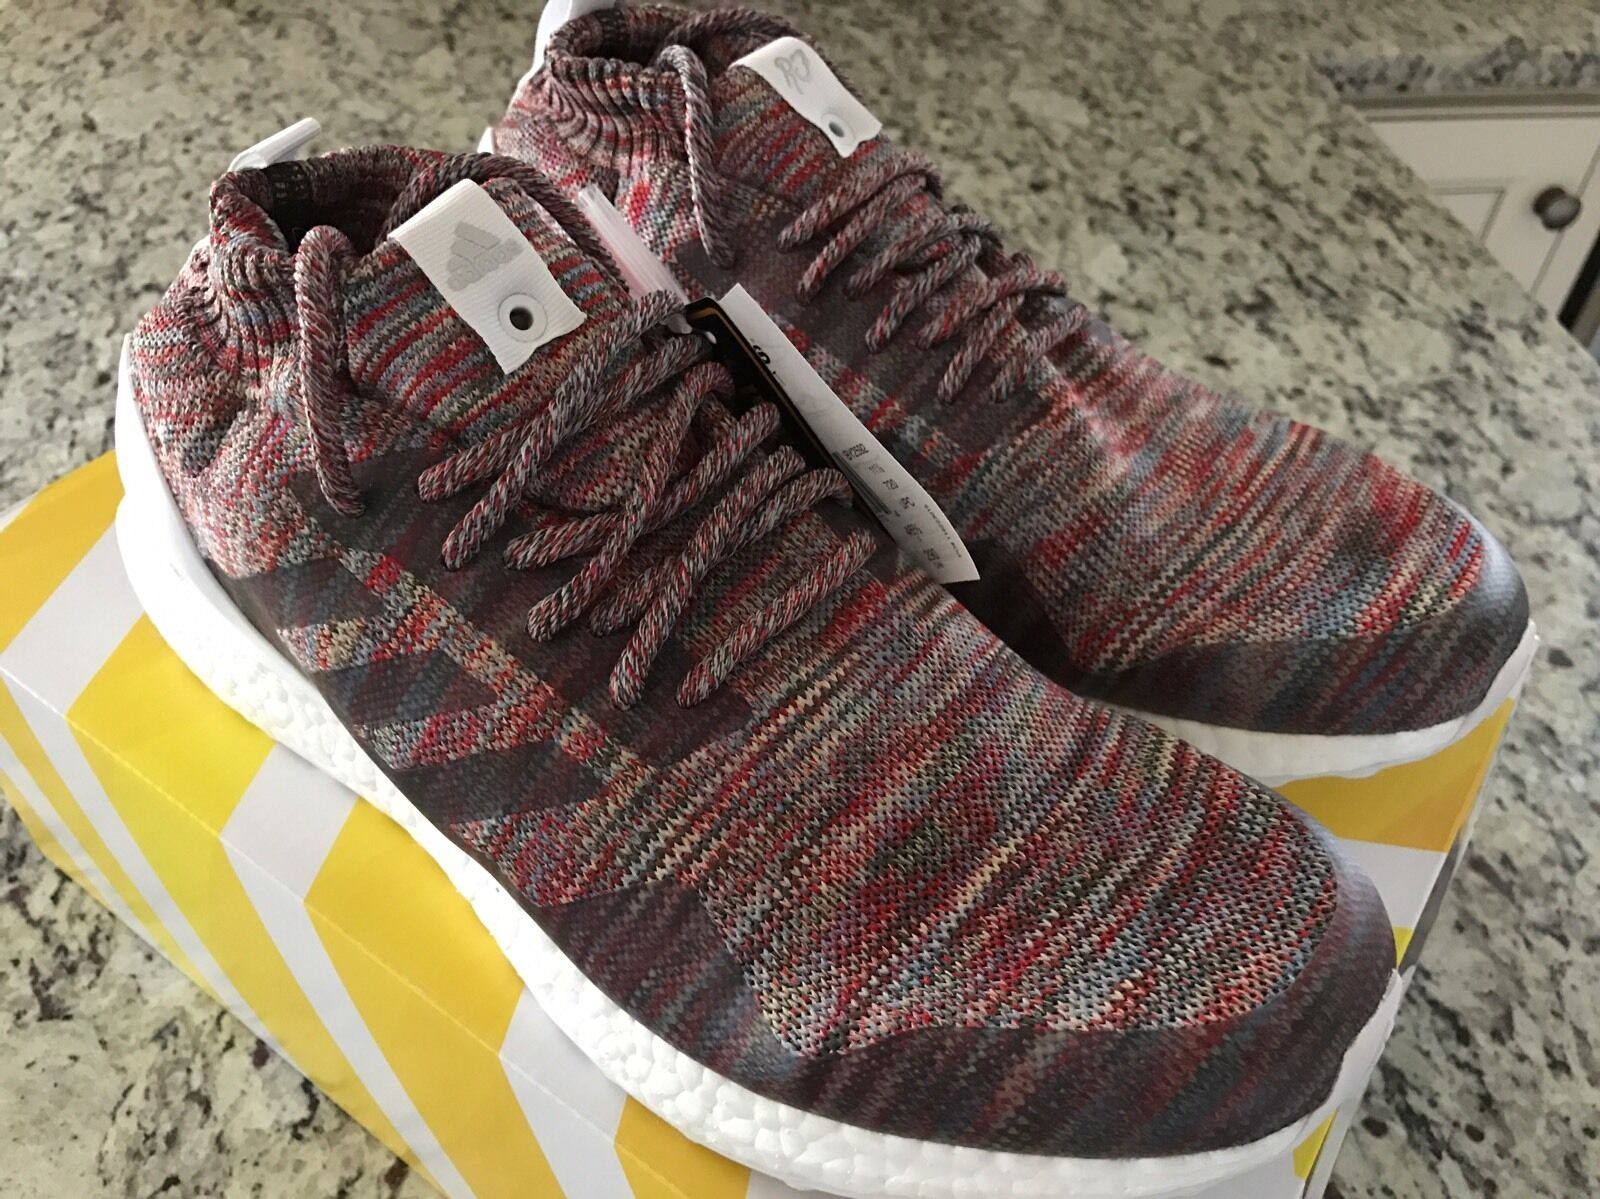 Adidas X Kith Ultra Boost Aspen Ronnie Fieg Size 12